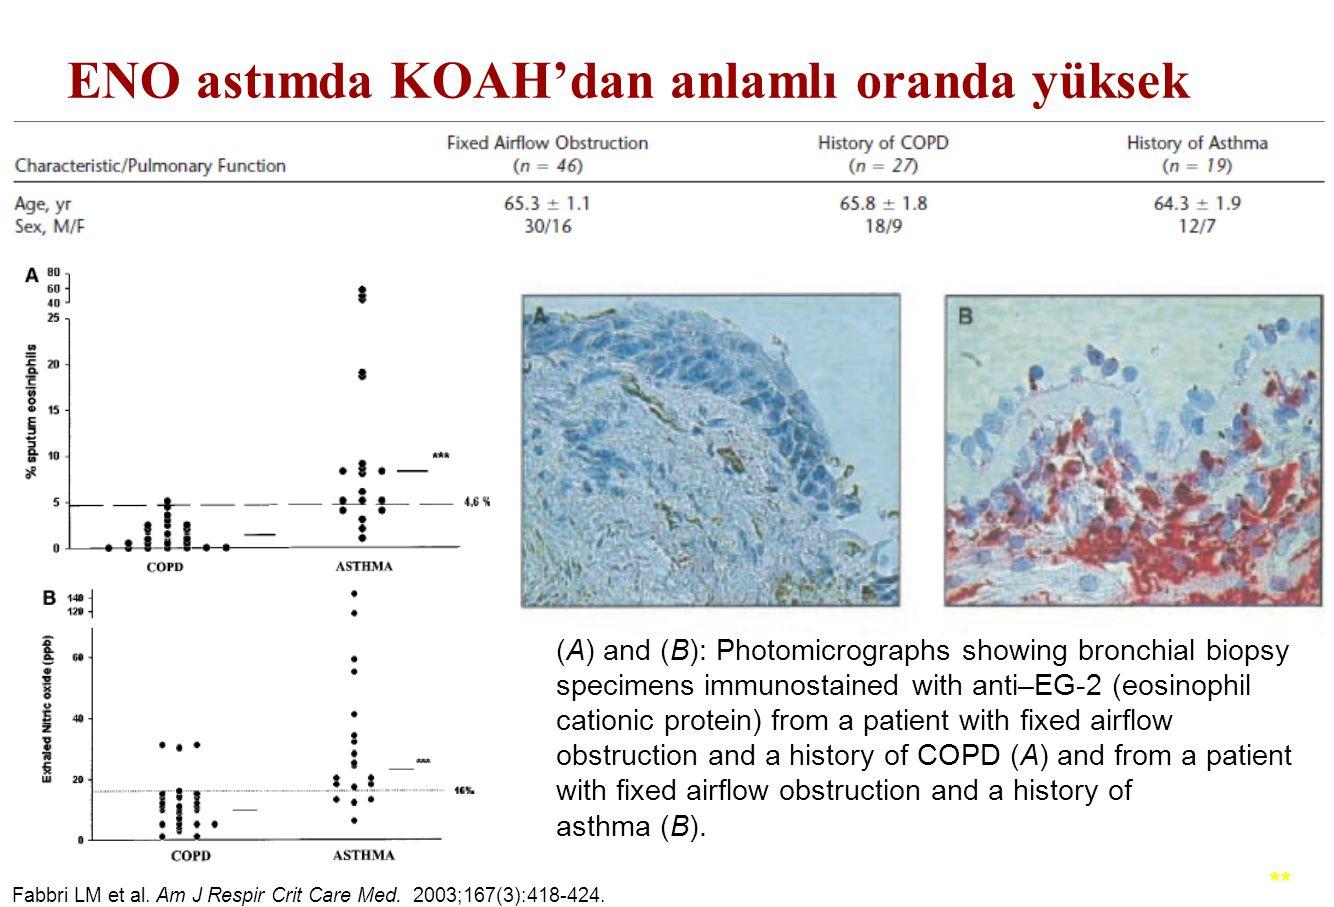 ENO astımda KOAH'dan anlamlı oranda yüksek Fabbri LM et al. Am J Respir Crit Care Med. 2003;167(3):418-424. ** (A) and (B): Photomicrographs showing b